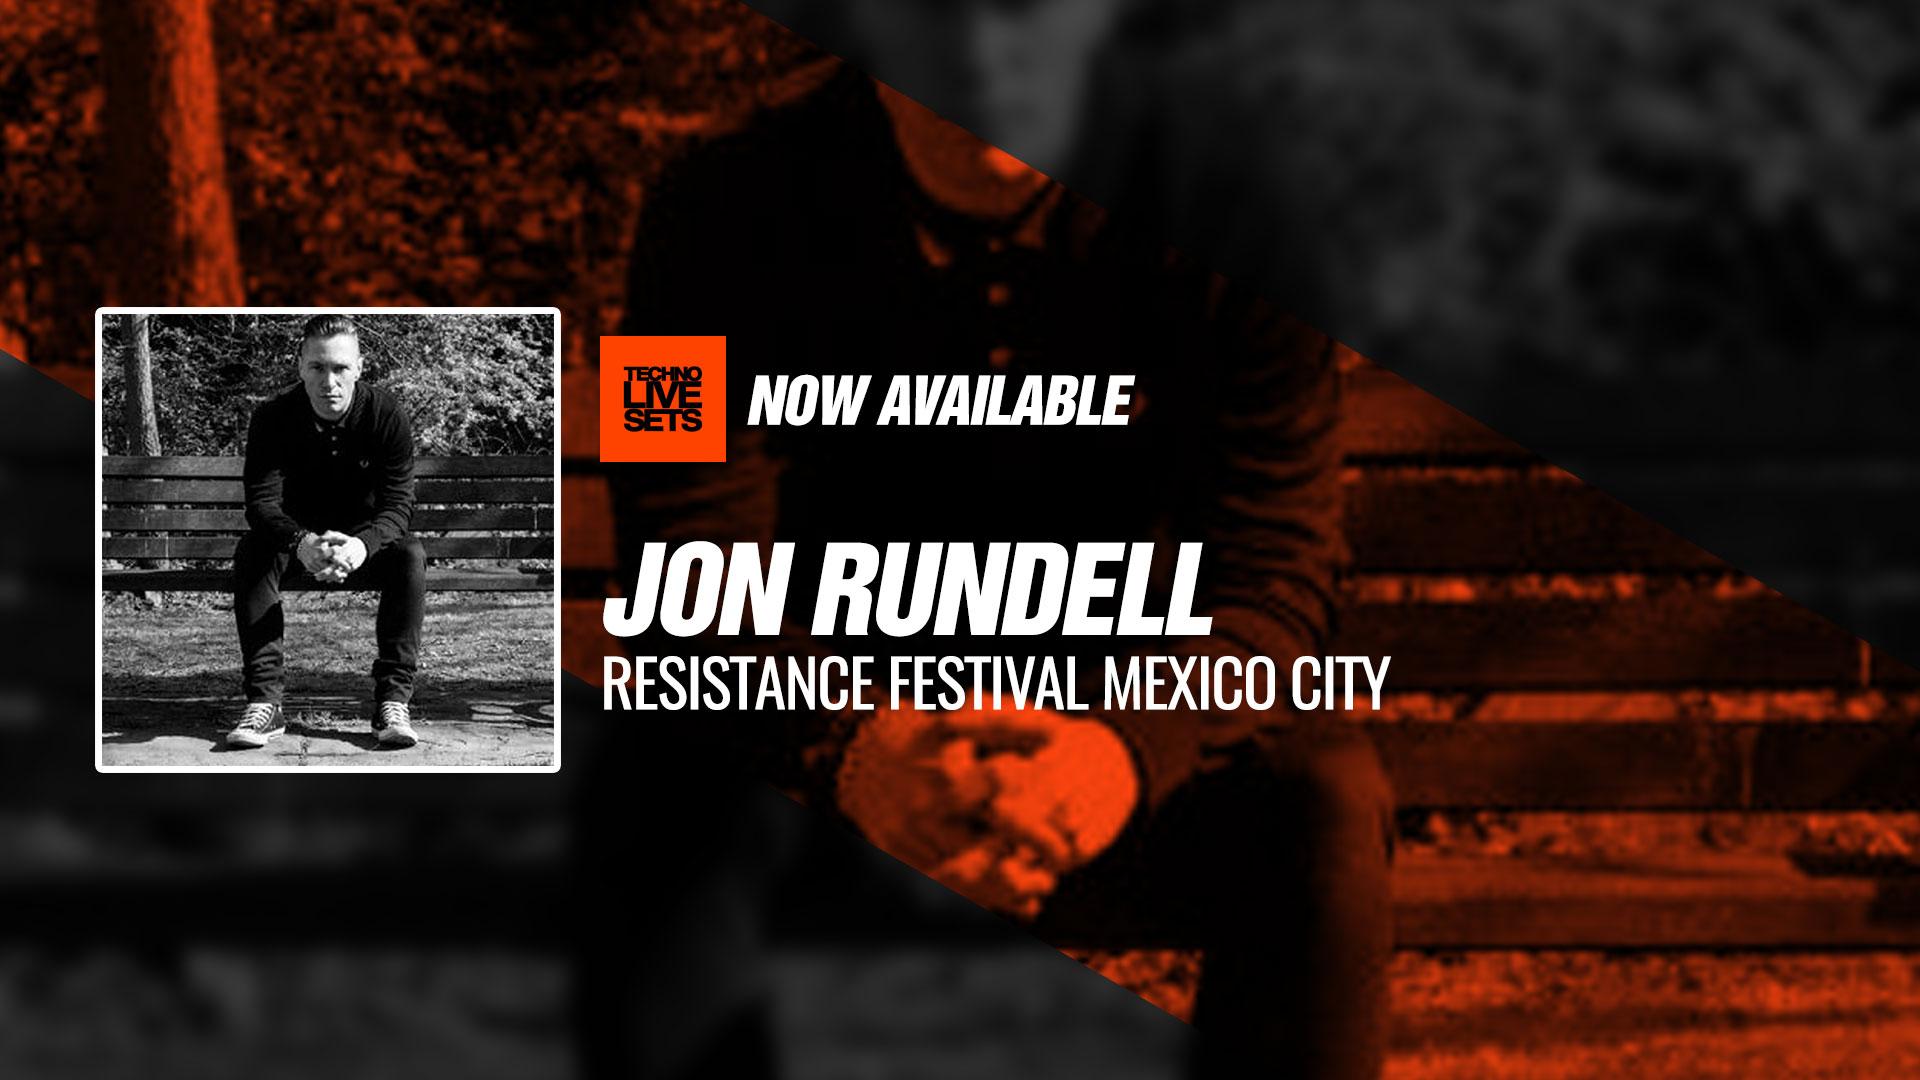 Jon Rundell 2019 Resistance Festival Mexico City 27-05-2018